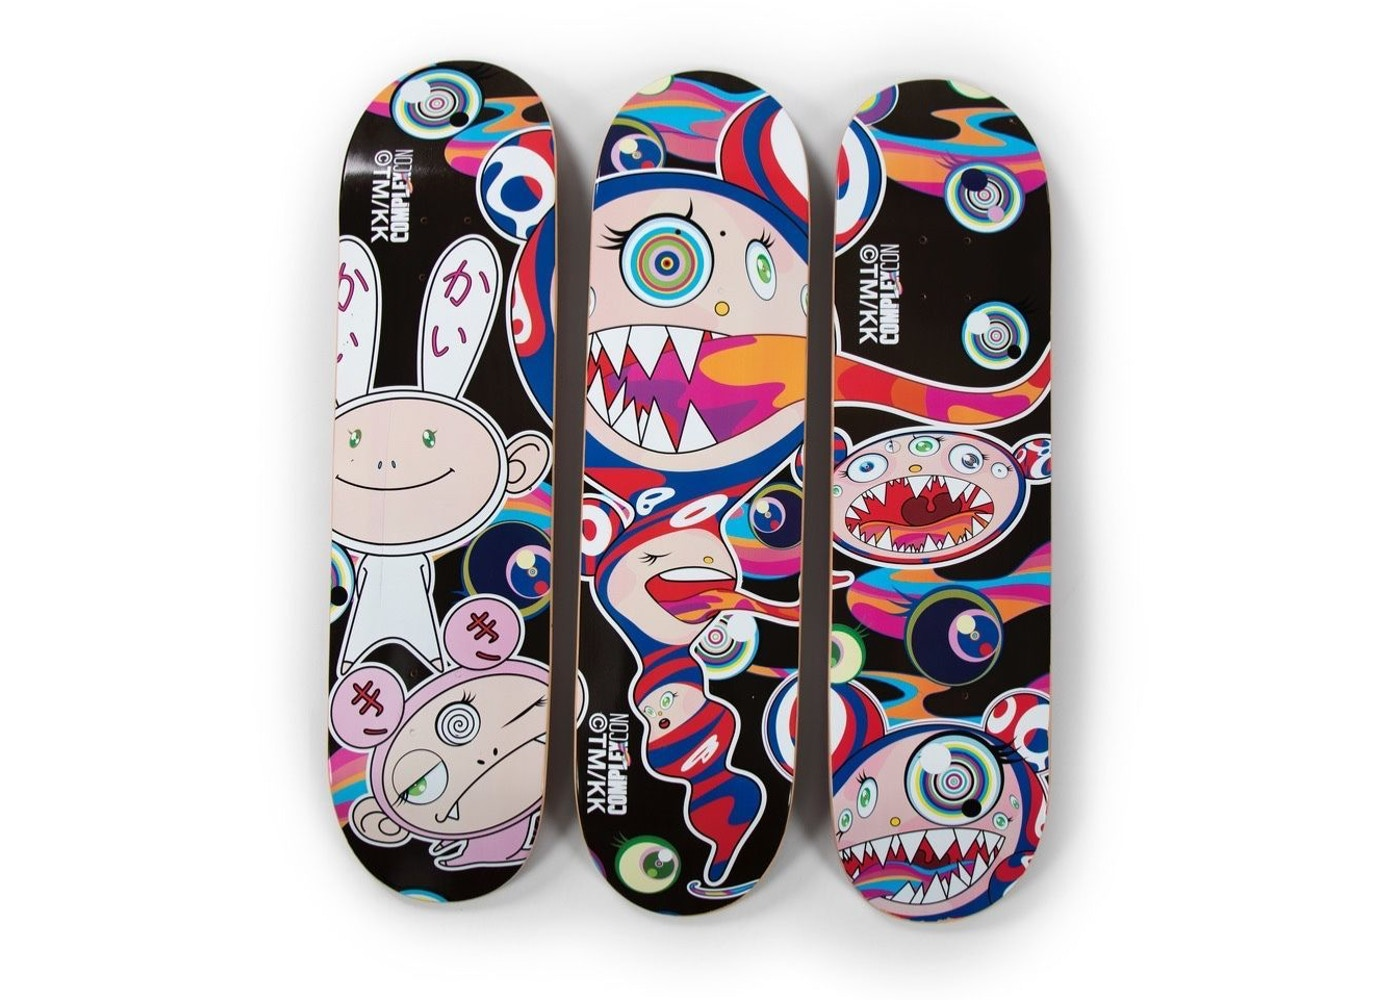 2fdc0e29 Streetwear - Other Brands Takashi Murakami - Last Sale